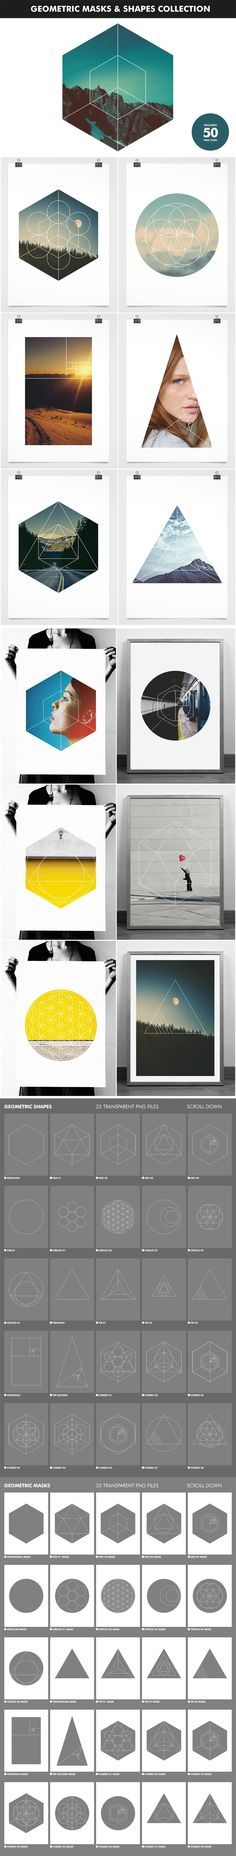 máscaras geométricas & coleção formatos Geometric Masks and Shapes Collection